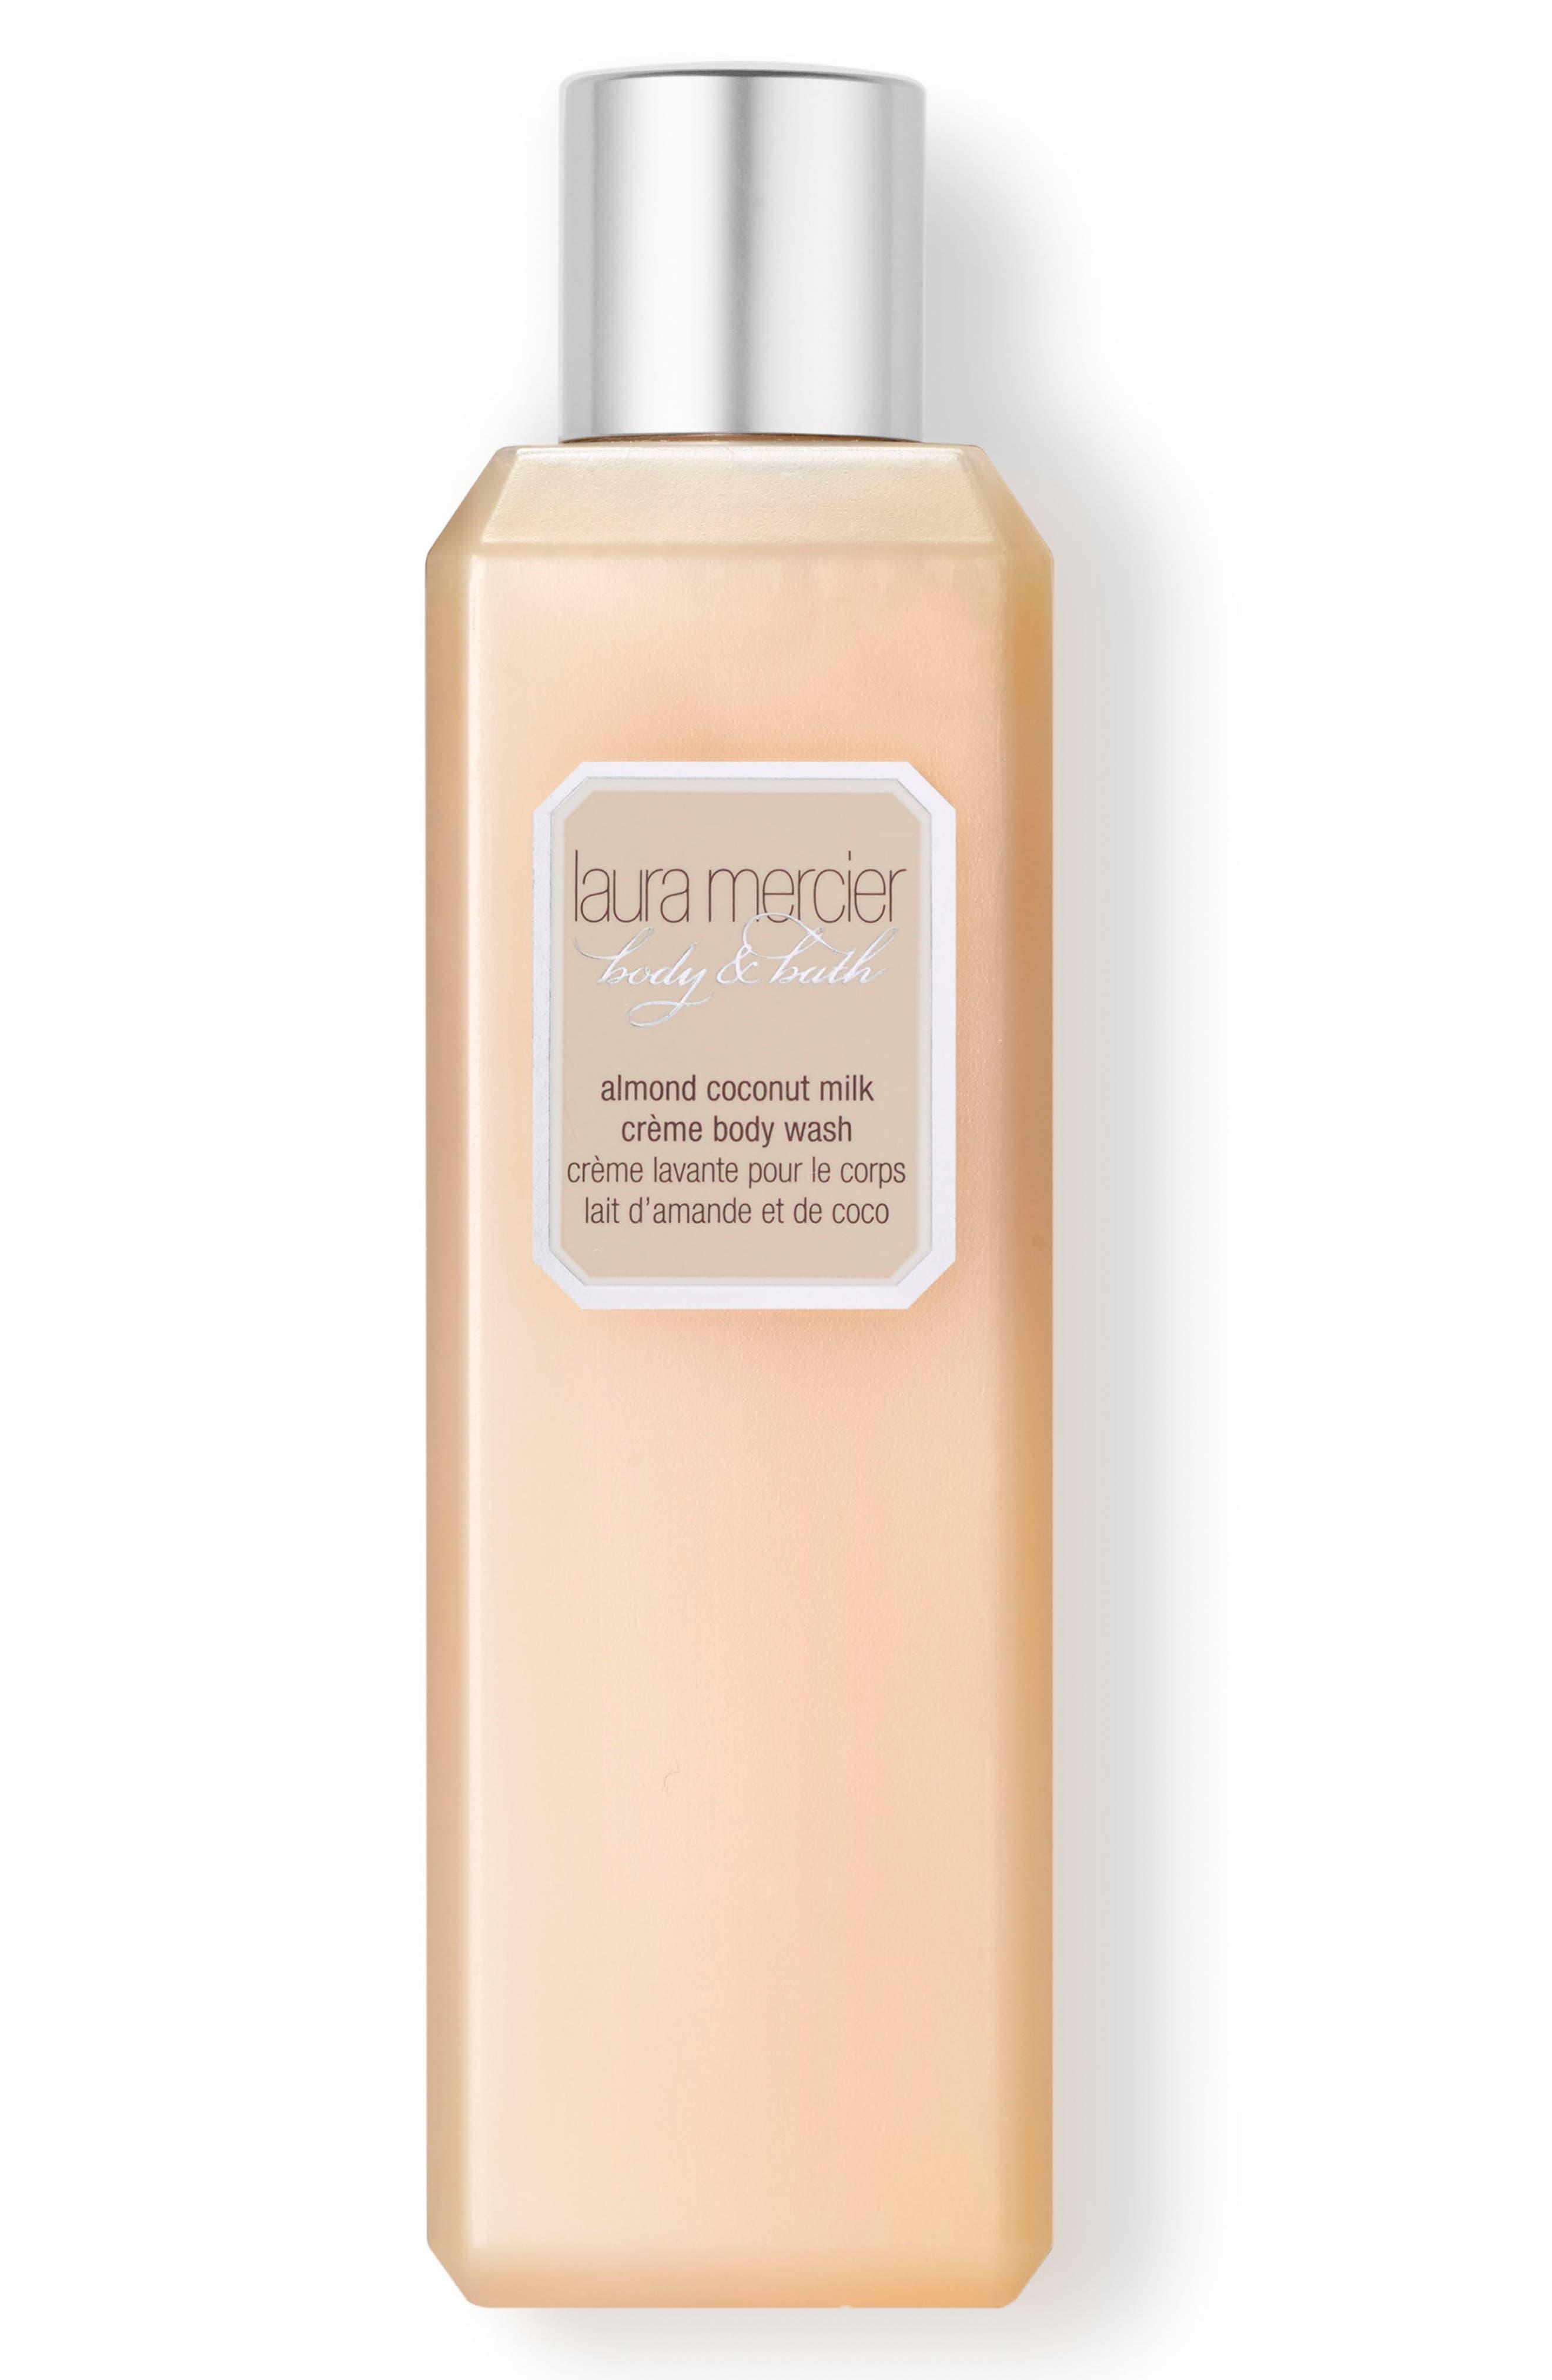 'Almond Coconut Milk' Crème Body Wash,                             Main thumbnail 1, color,                             NO COLOR